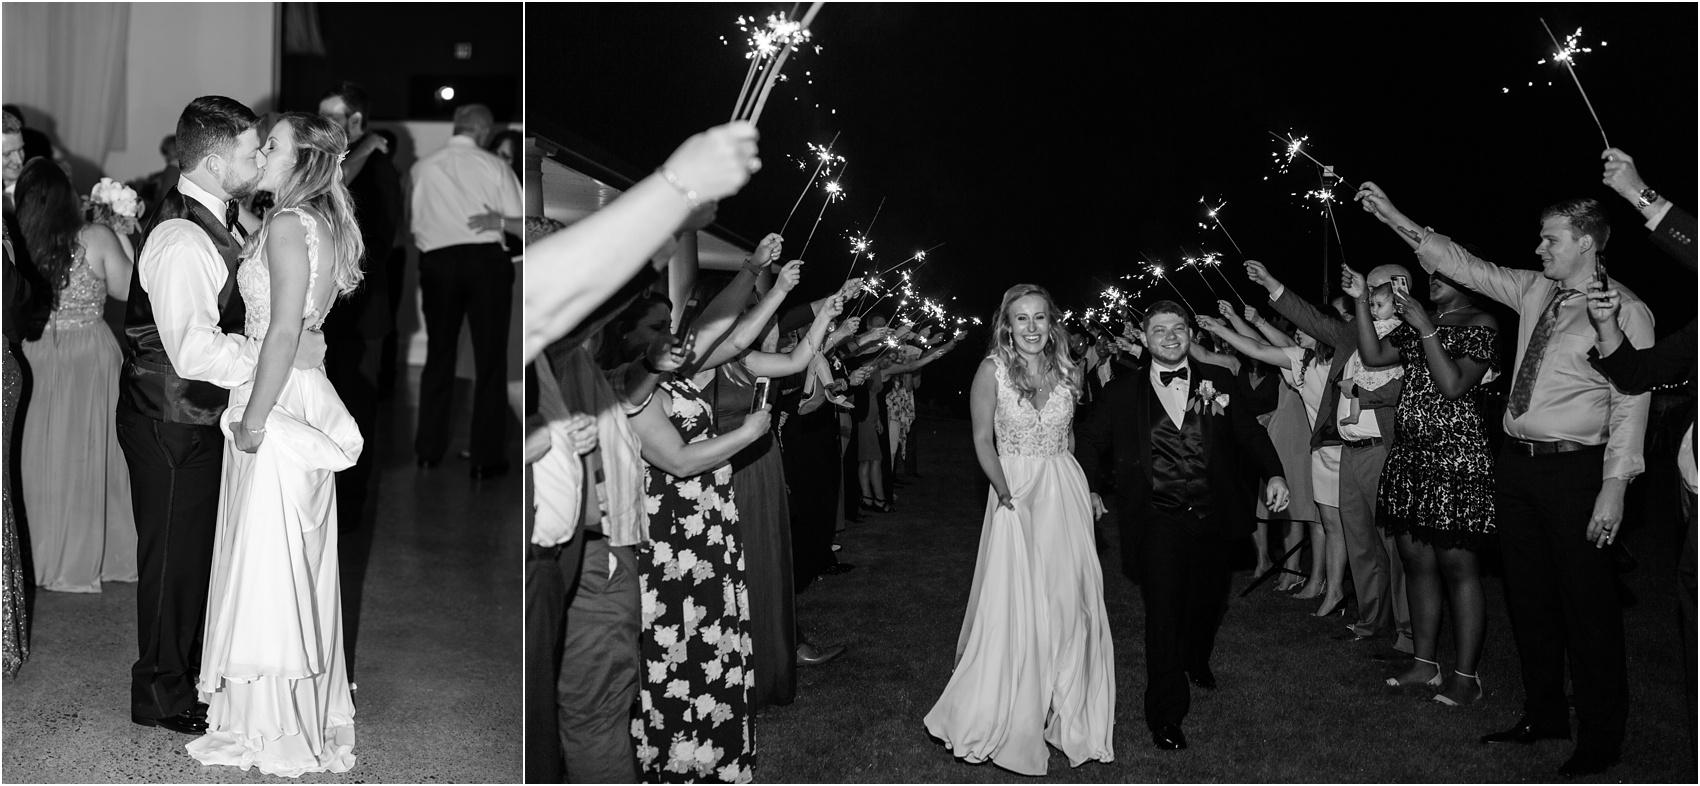 Savannah Eve Photography- Jurek-Woodworth Wedding- Sneak Peek-116.jpg